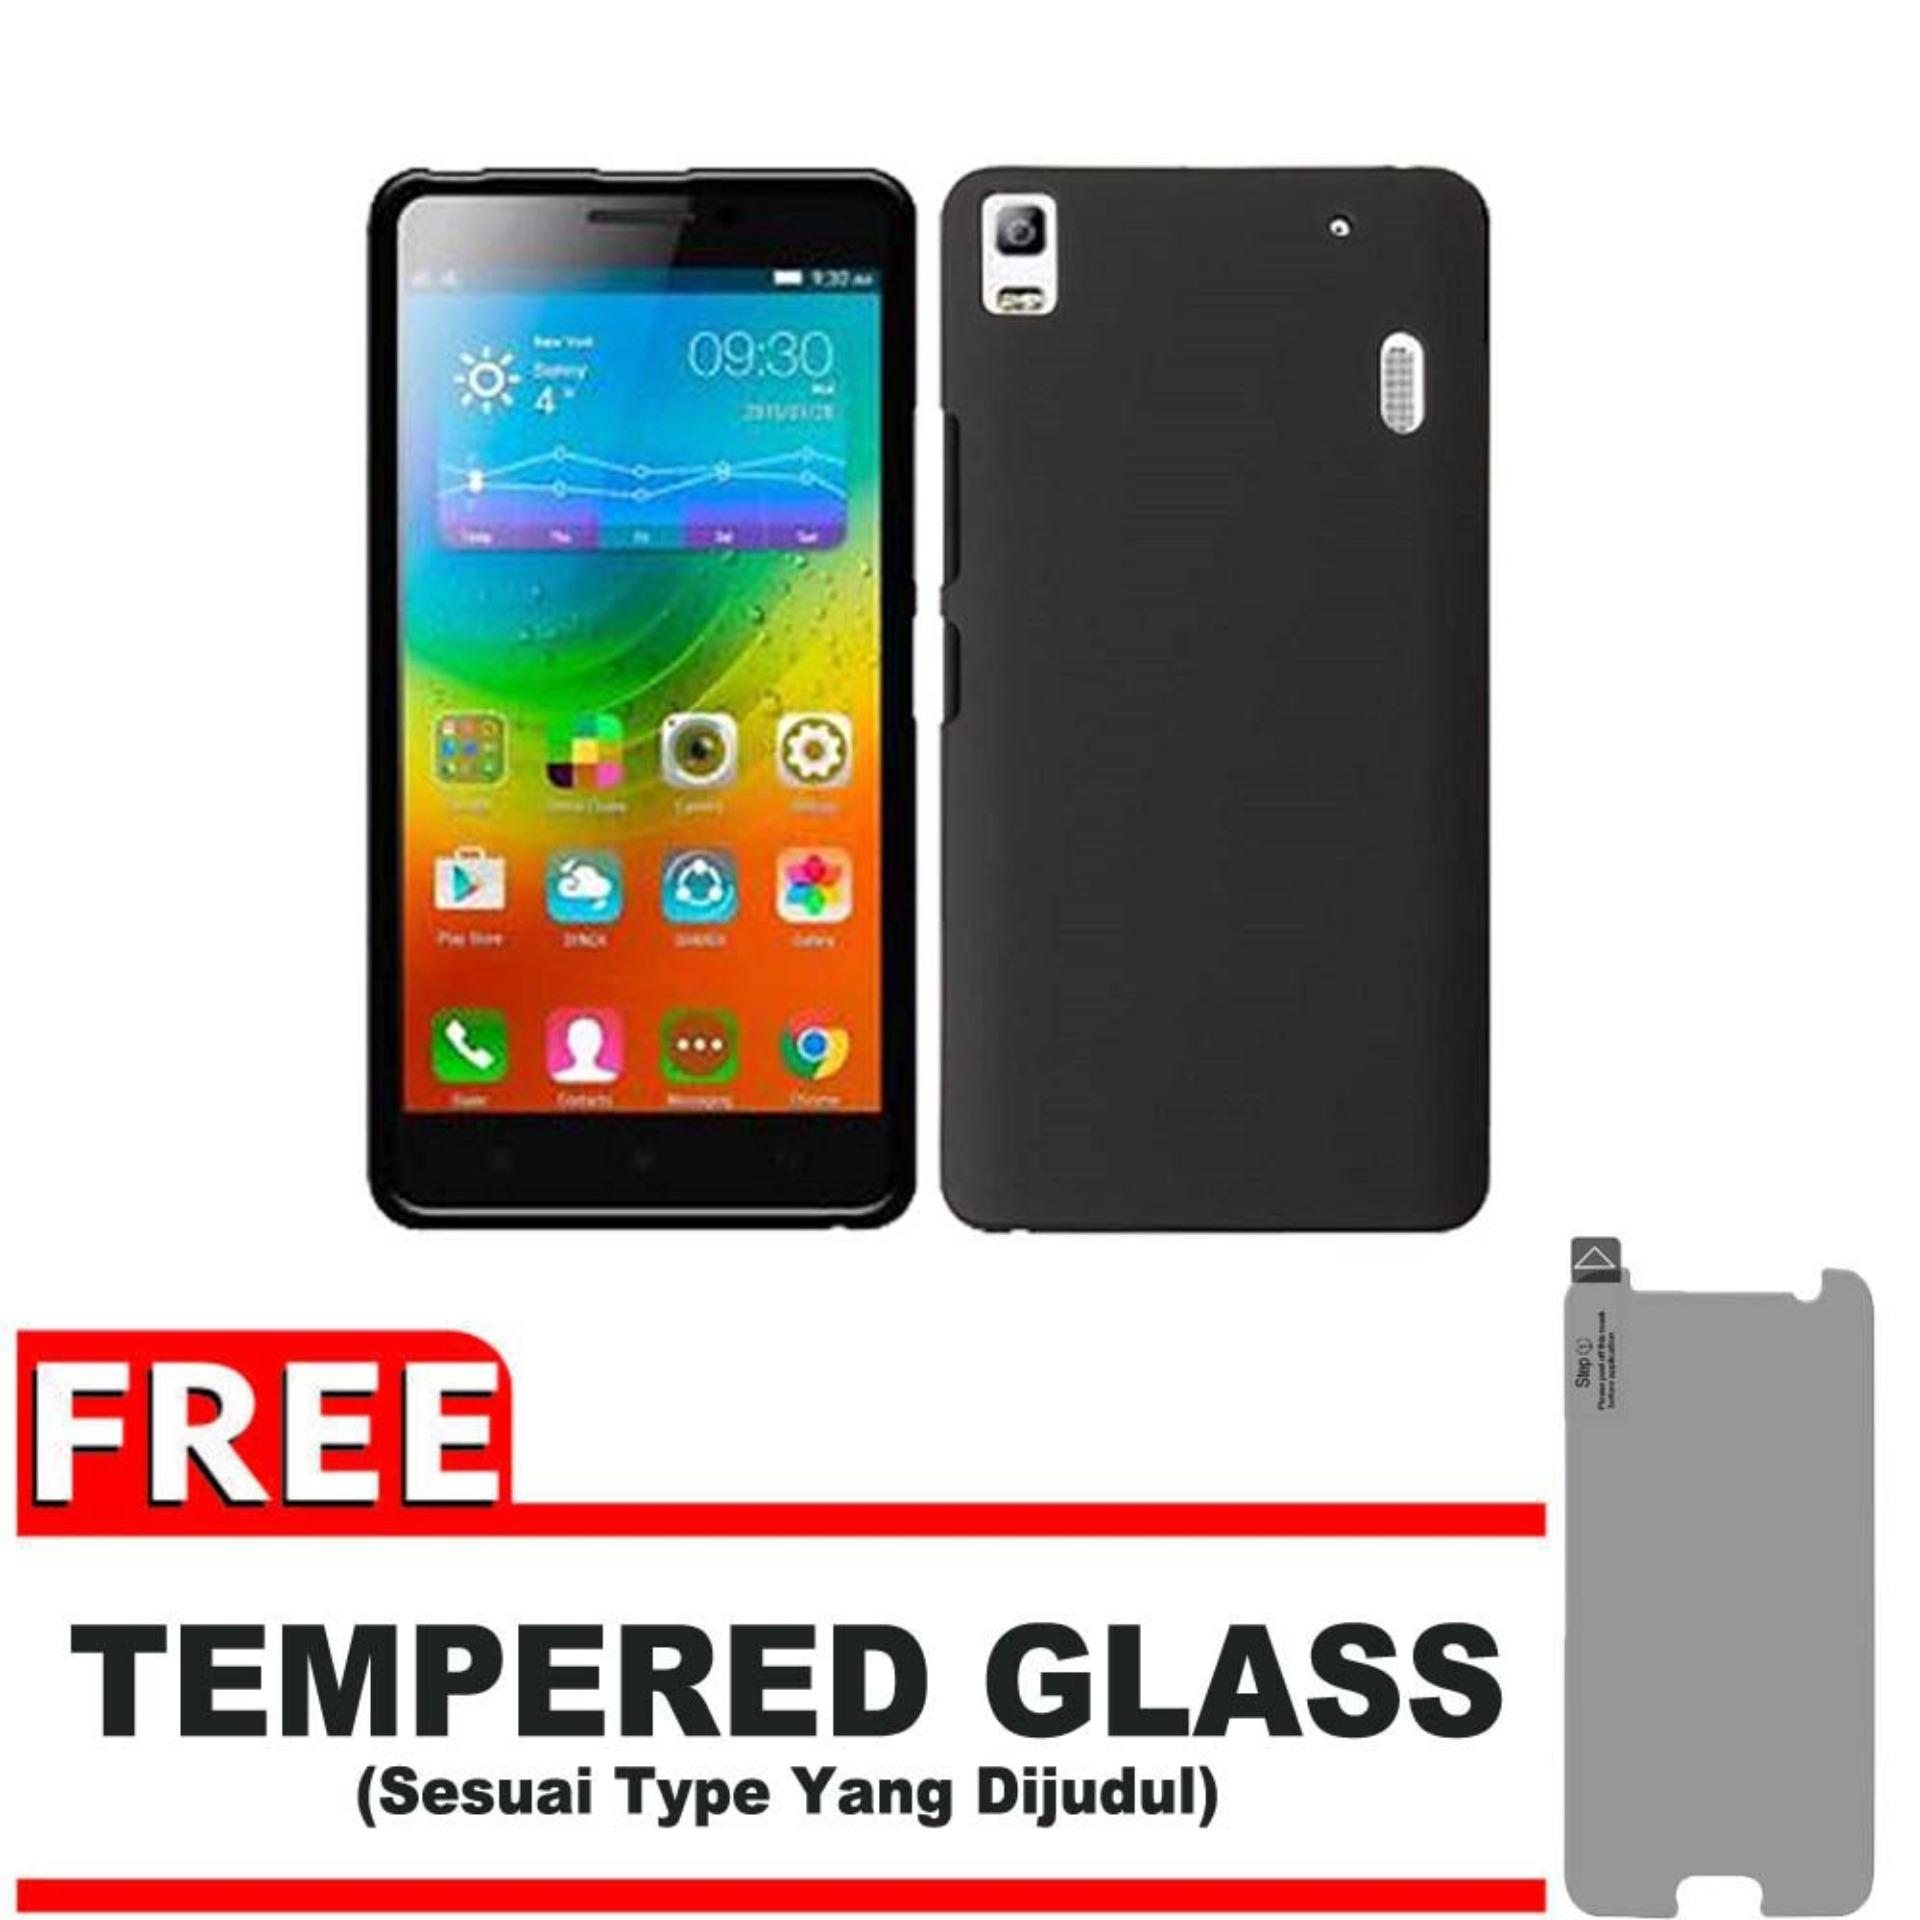 DarkNight for Lenovo A7000 / A7000 + Plus / K3 Note | Slim Case Black Matte Softcase Premium (Anti Minyak/Anti Sidik Jari) + Gratis Free Tempered Glass Protector - Hitam Doff